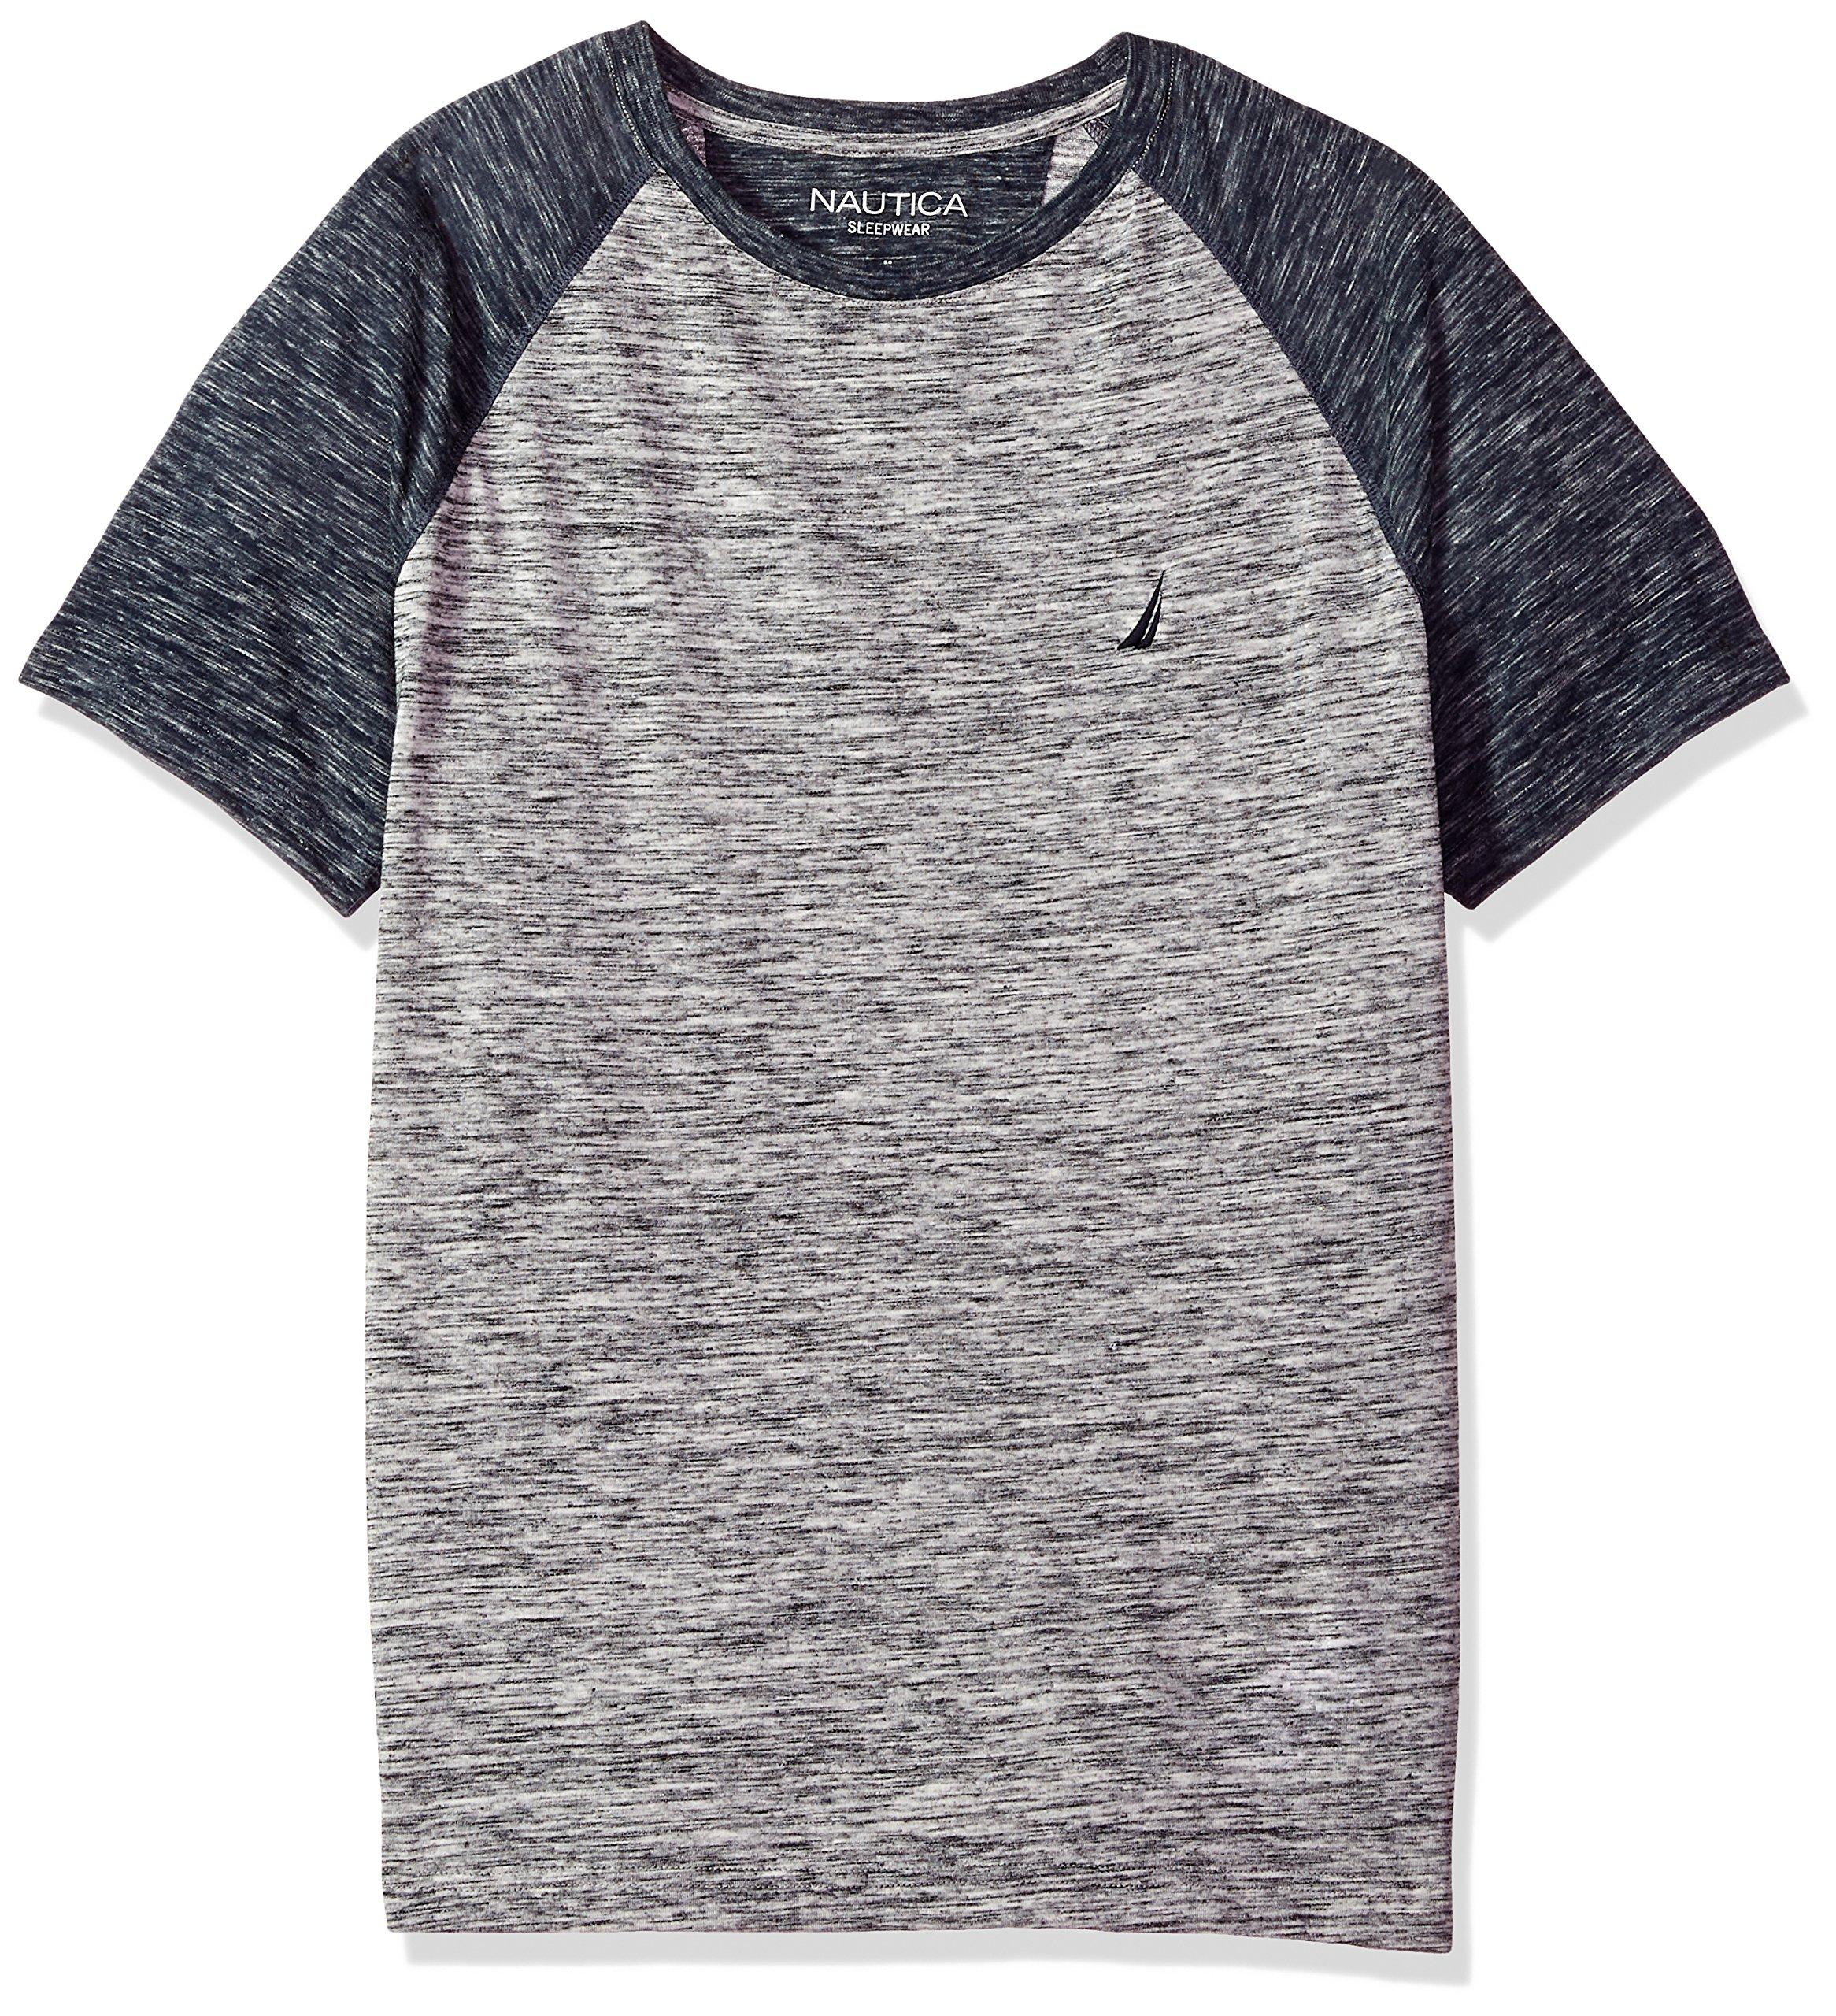 Nautica Men's Comfort Space Dye Contrast Tee, Gray/Gray, Medium by Nautica